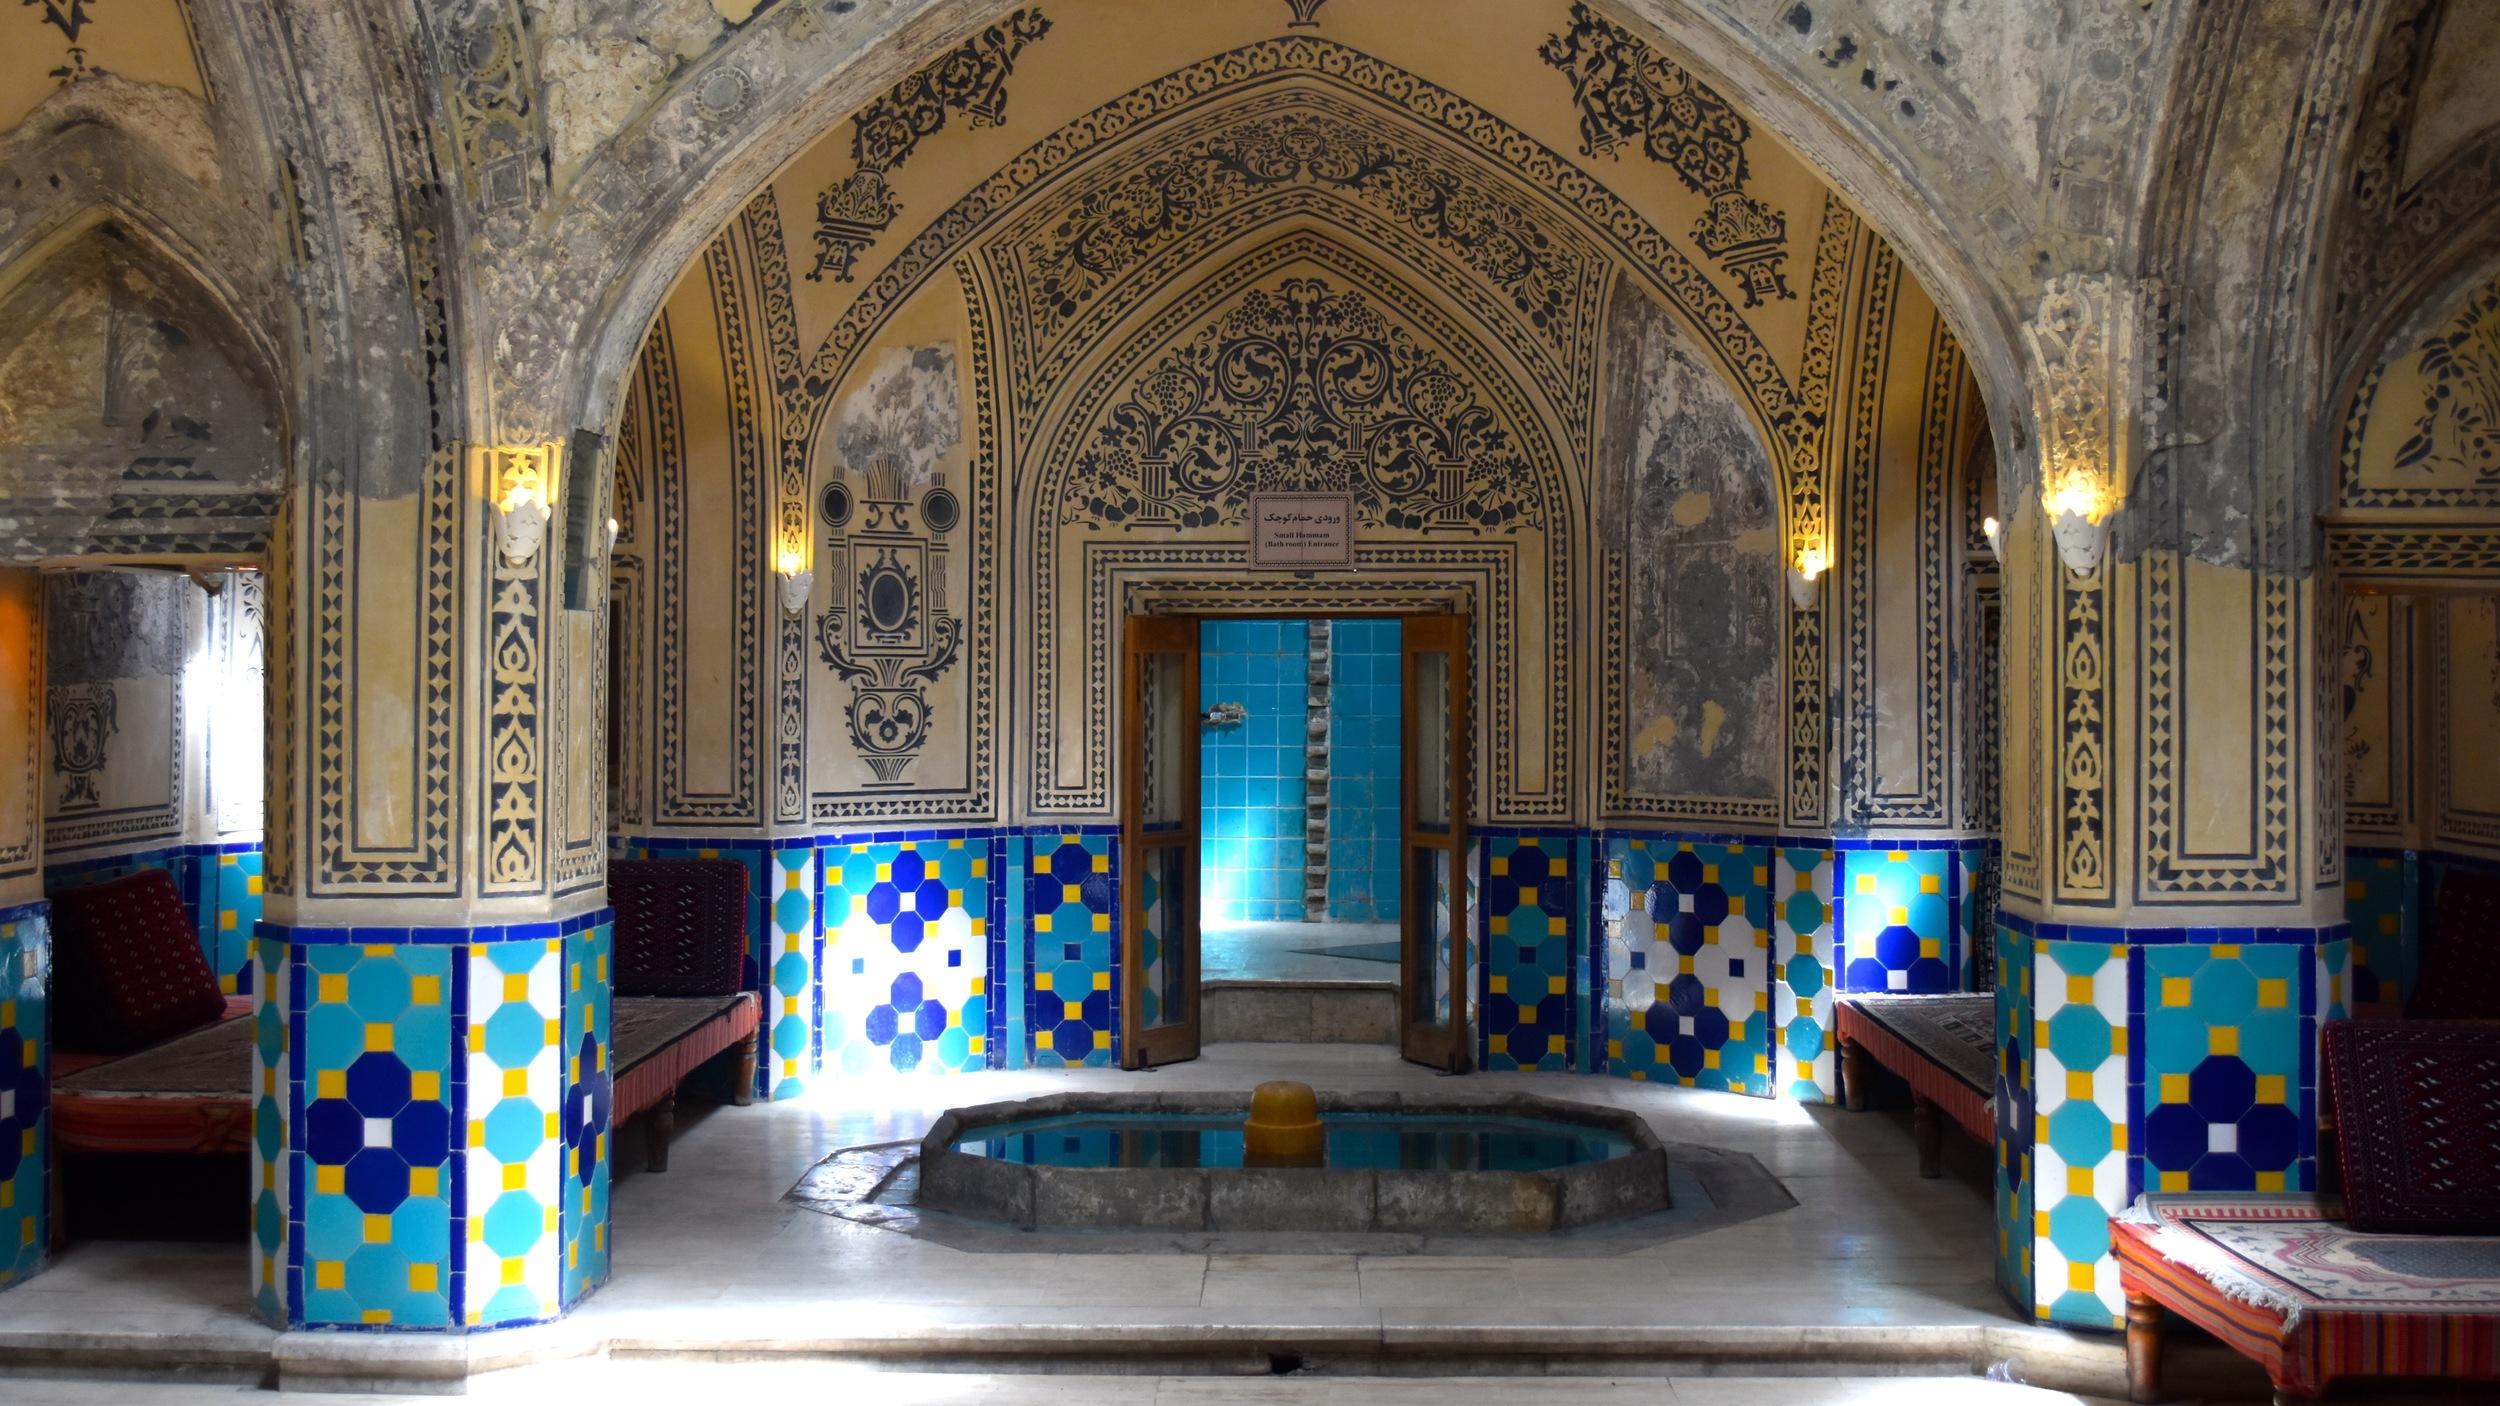 Iran-Kashan-bathhouse-interior.jpg